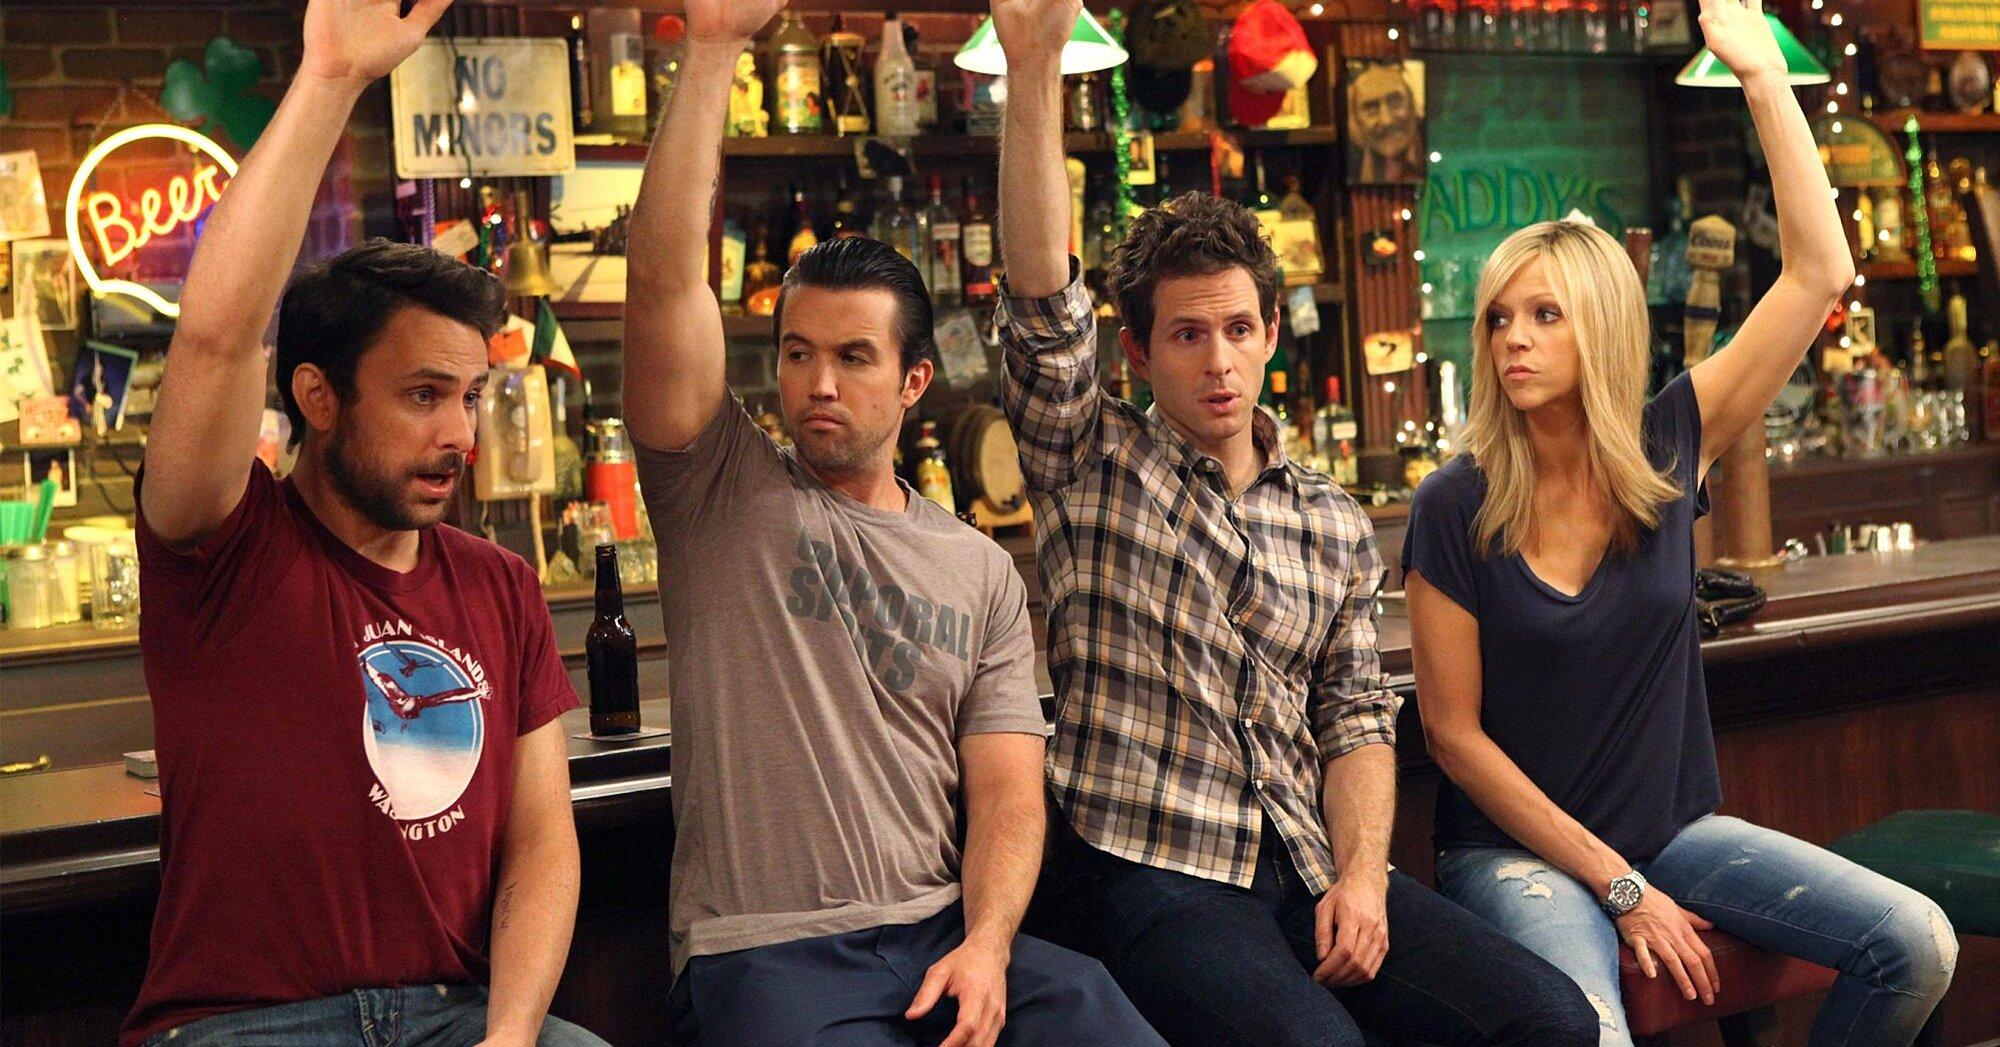 New season of 'It's Always Sunny in Philadelphia' will tackle coronavirus - Entertainment Weekly